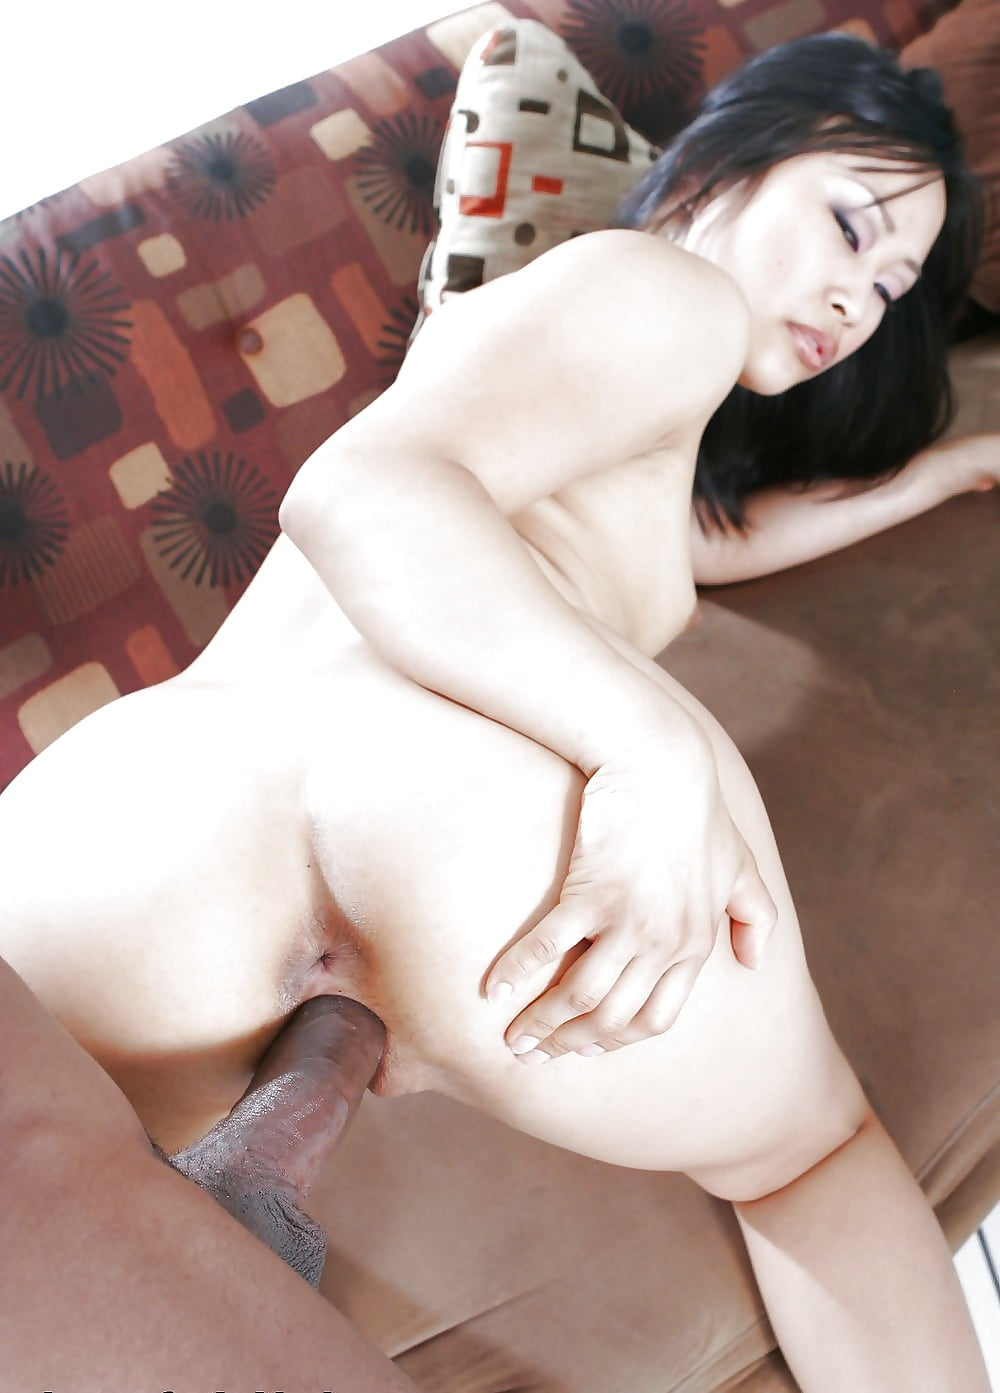 Asian male white female anal tranny